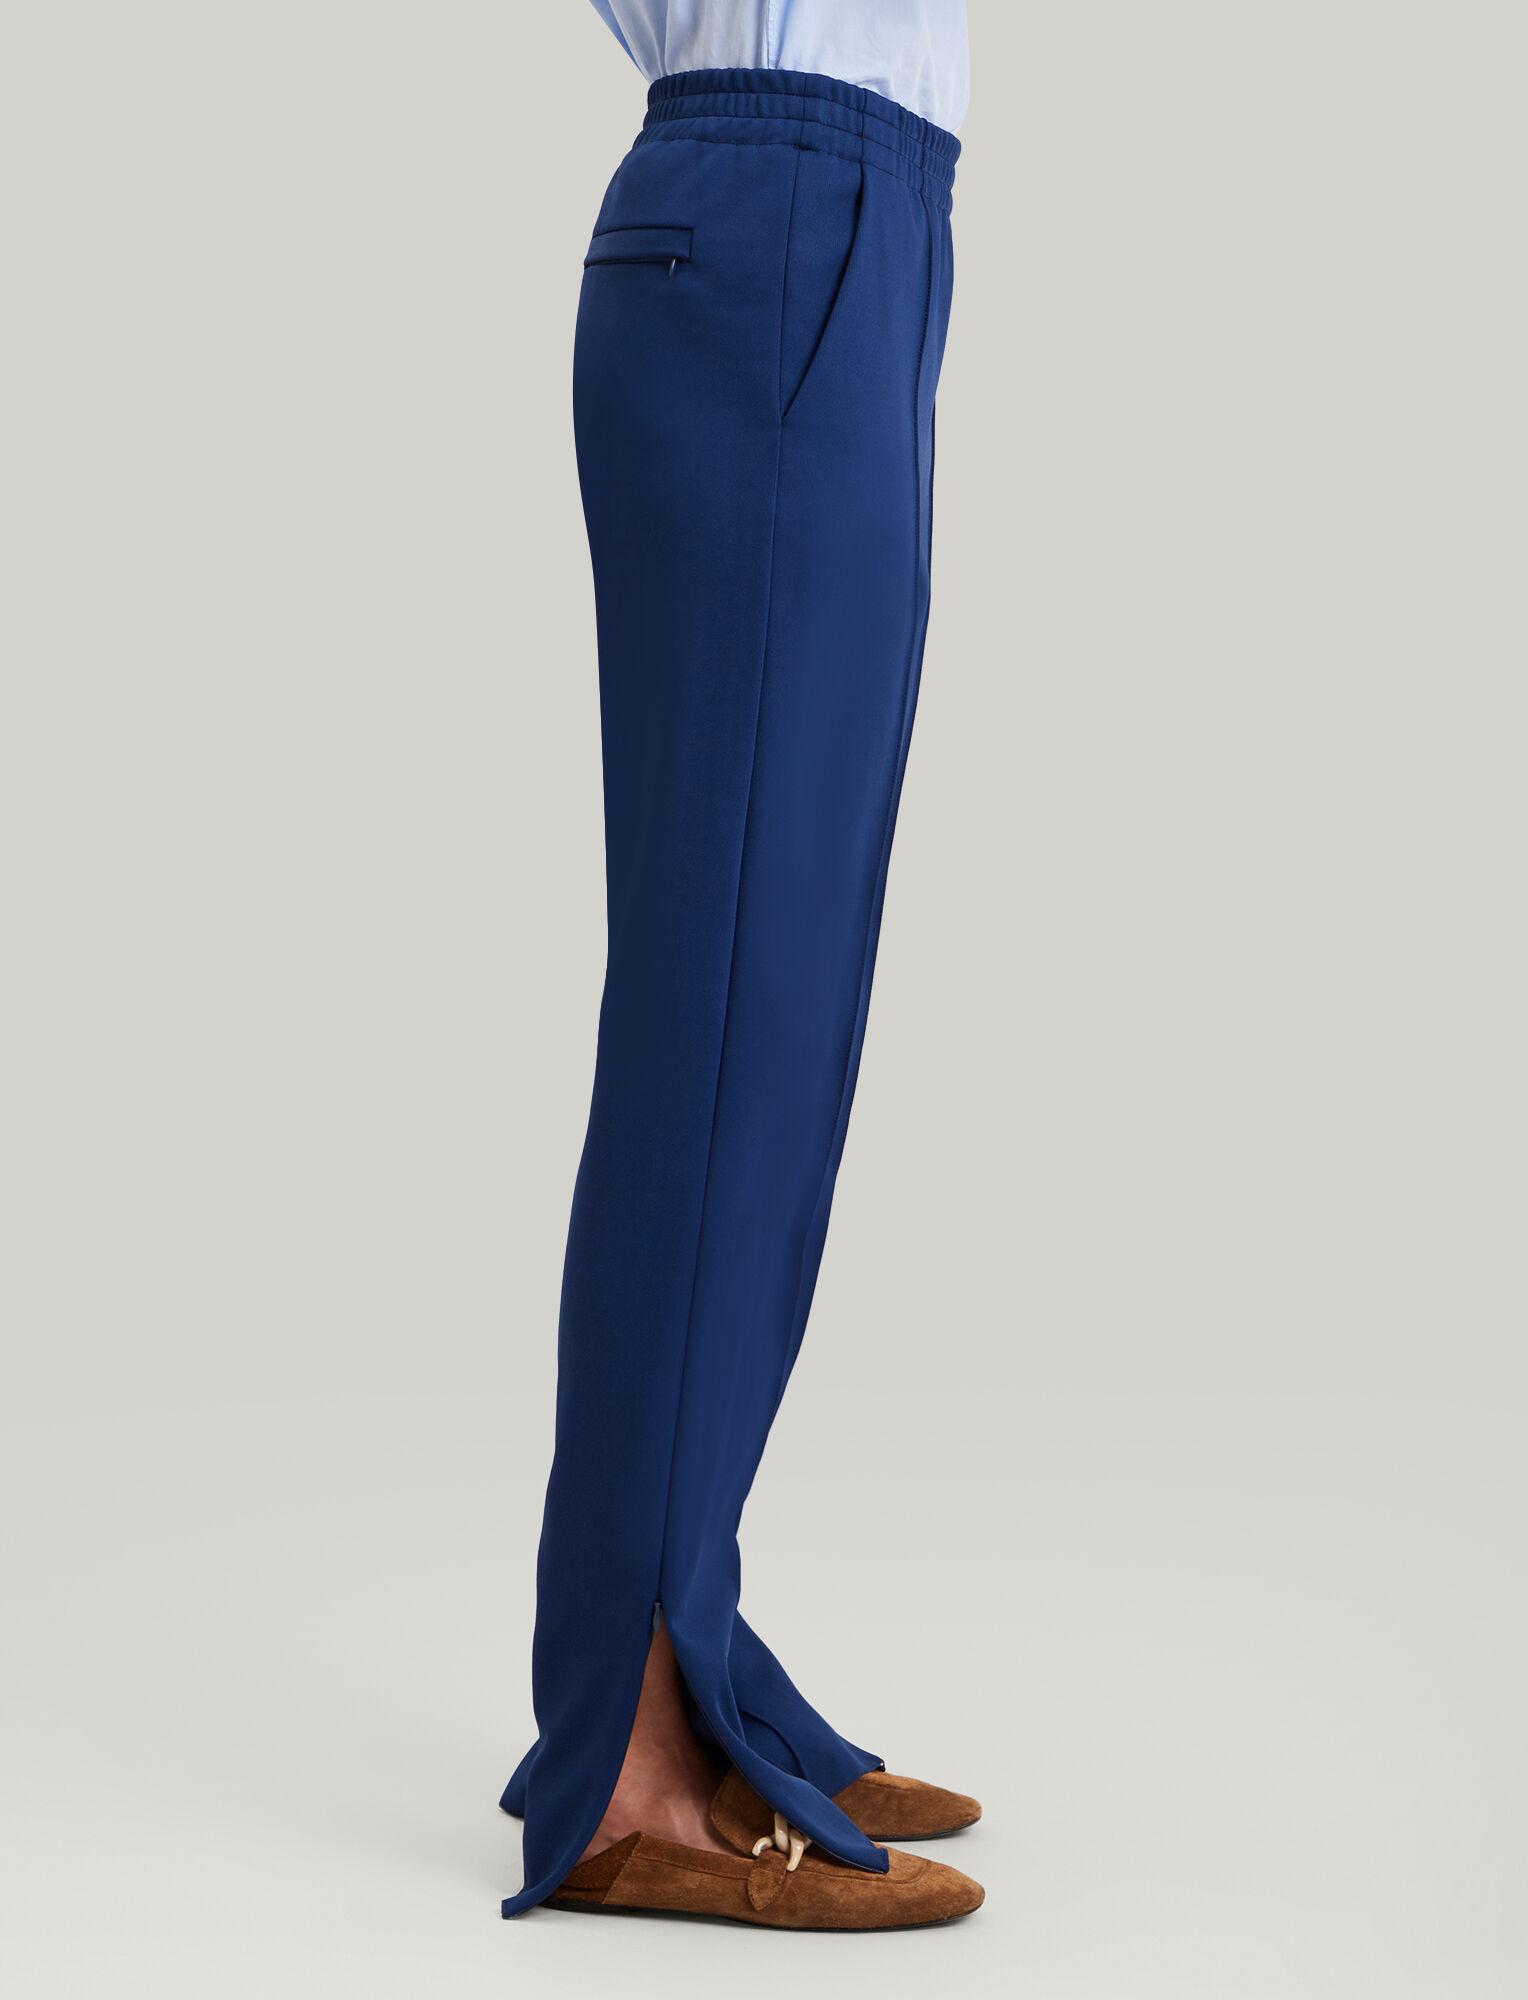 Joseph, Jog Technical Jersey Trousers, in ROYAL BLUE